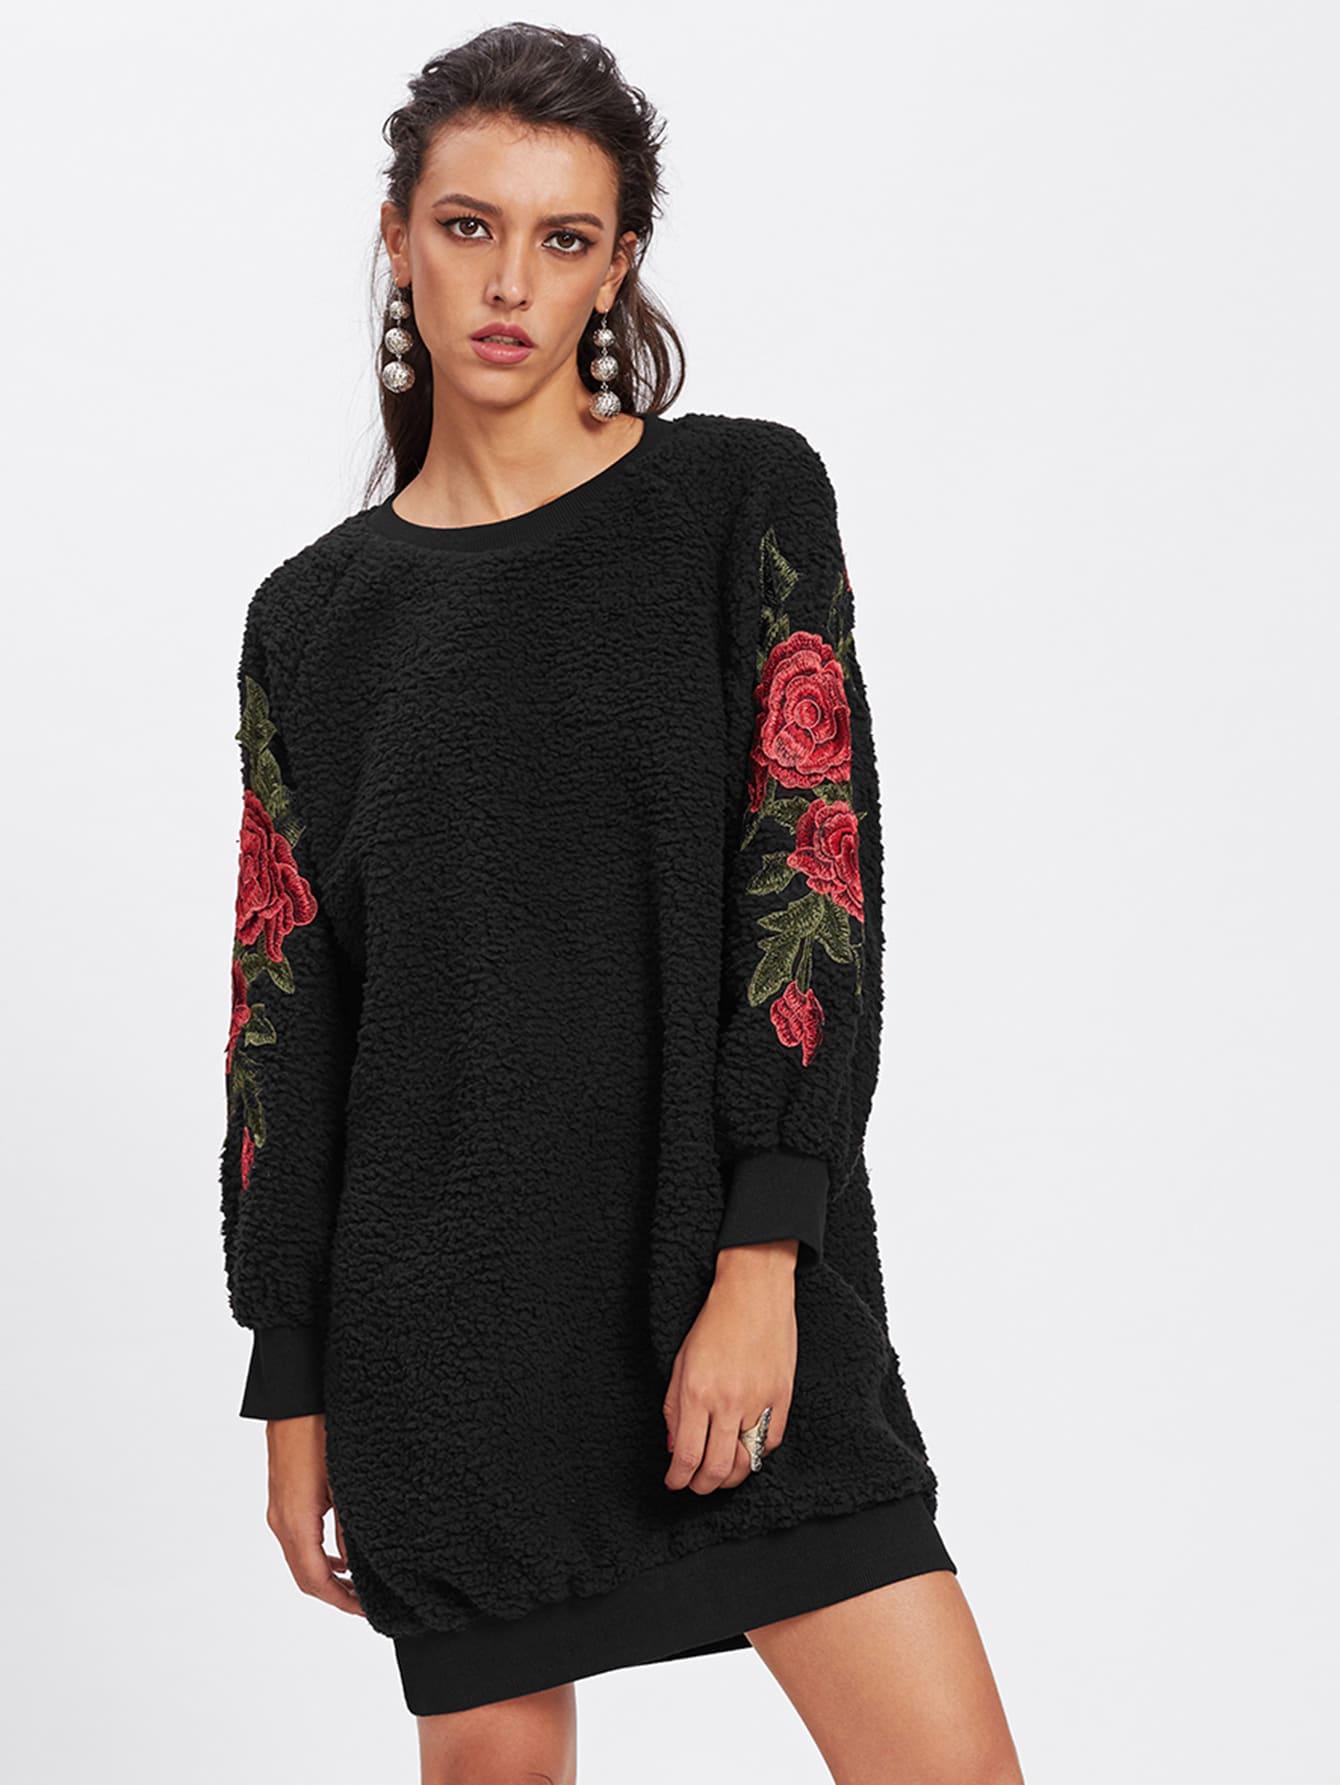 Embroidered Rose Applique Fluffy Sweatshirt Dress embroidered rose applique side split belt dress